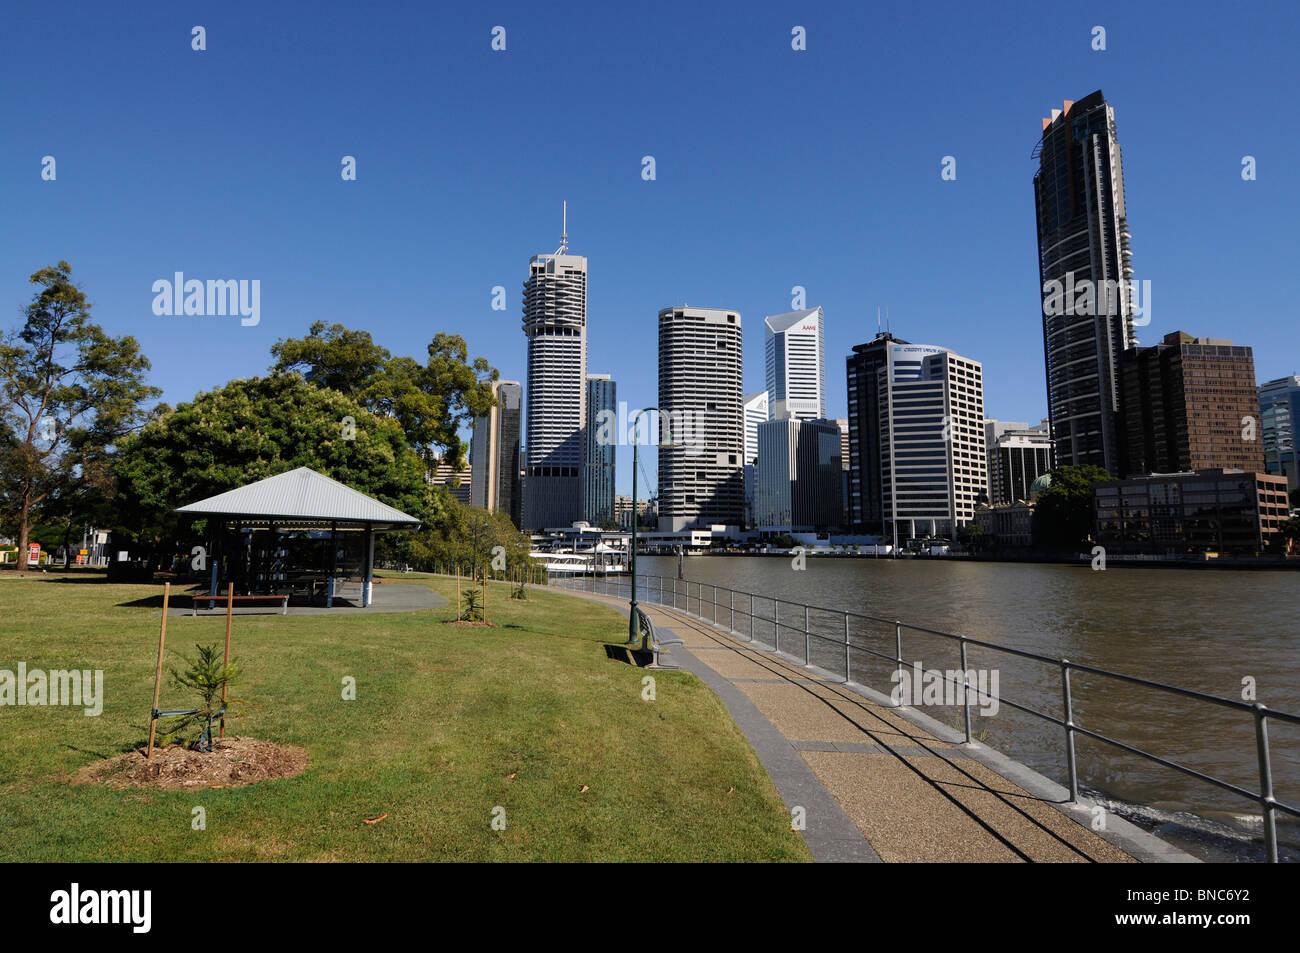 Brisbane's city skyline and business district on the Brisbane river. Queensland, Australia - Stock Image